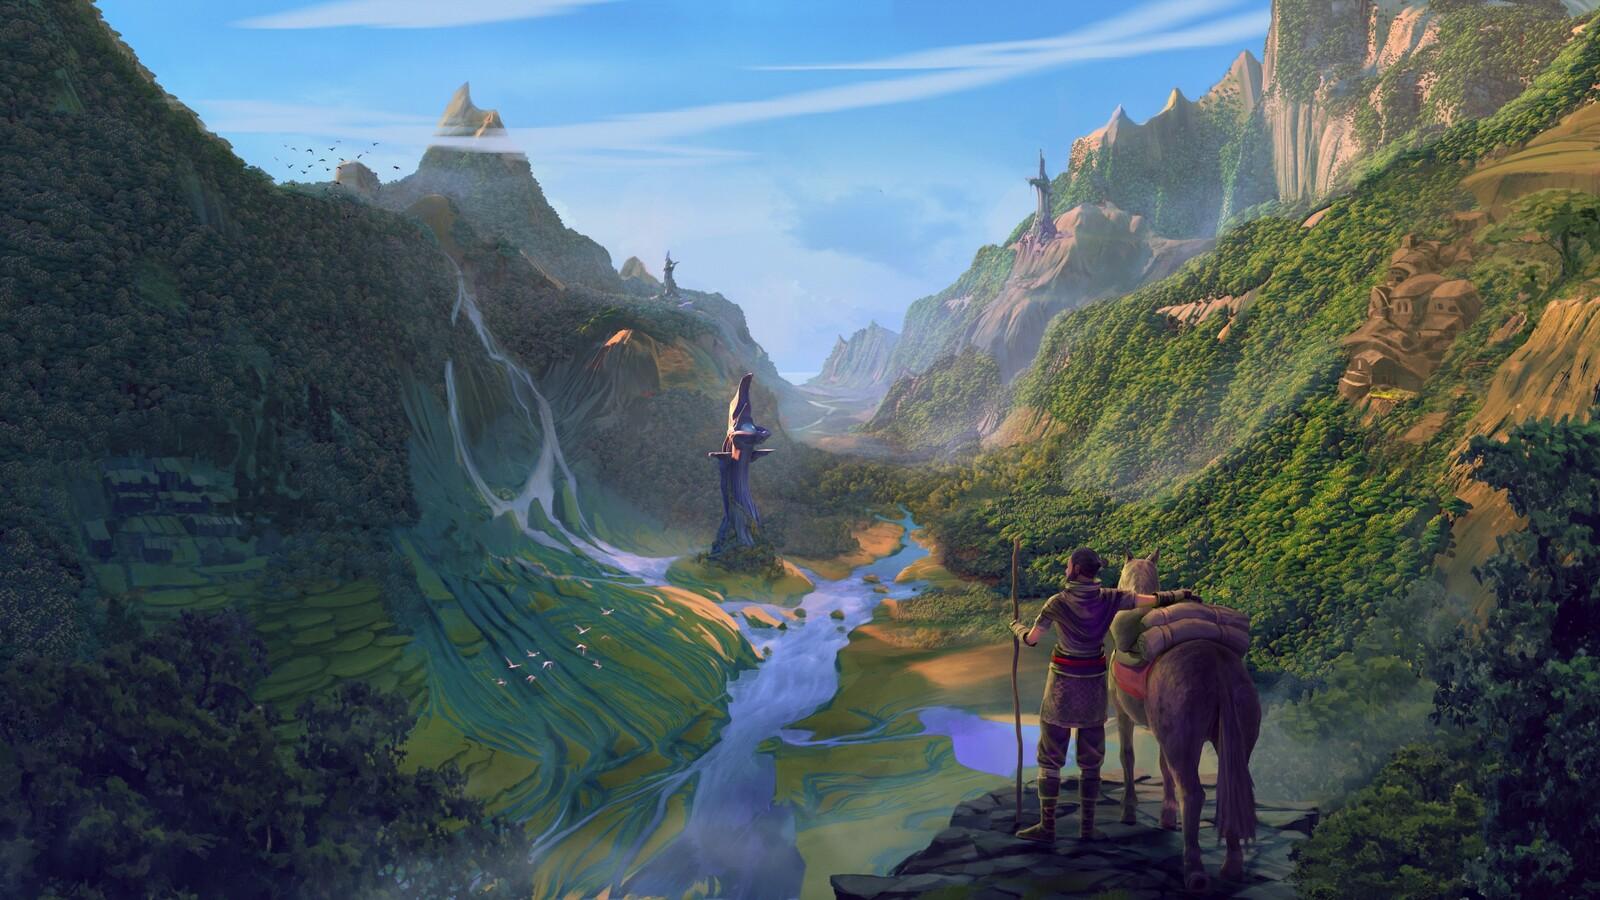 Mythwind Valley